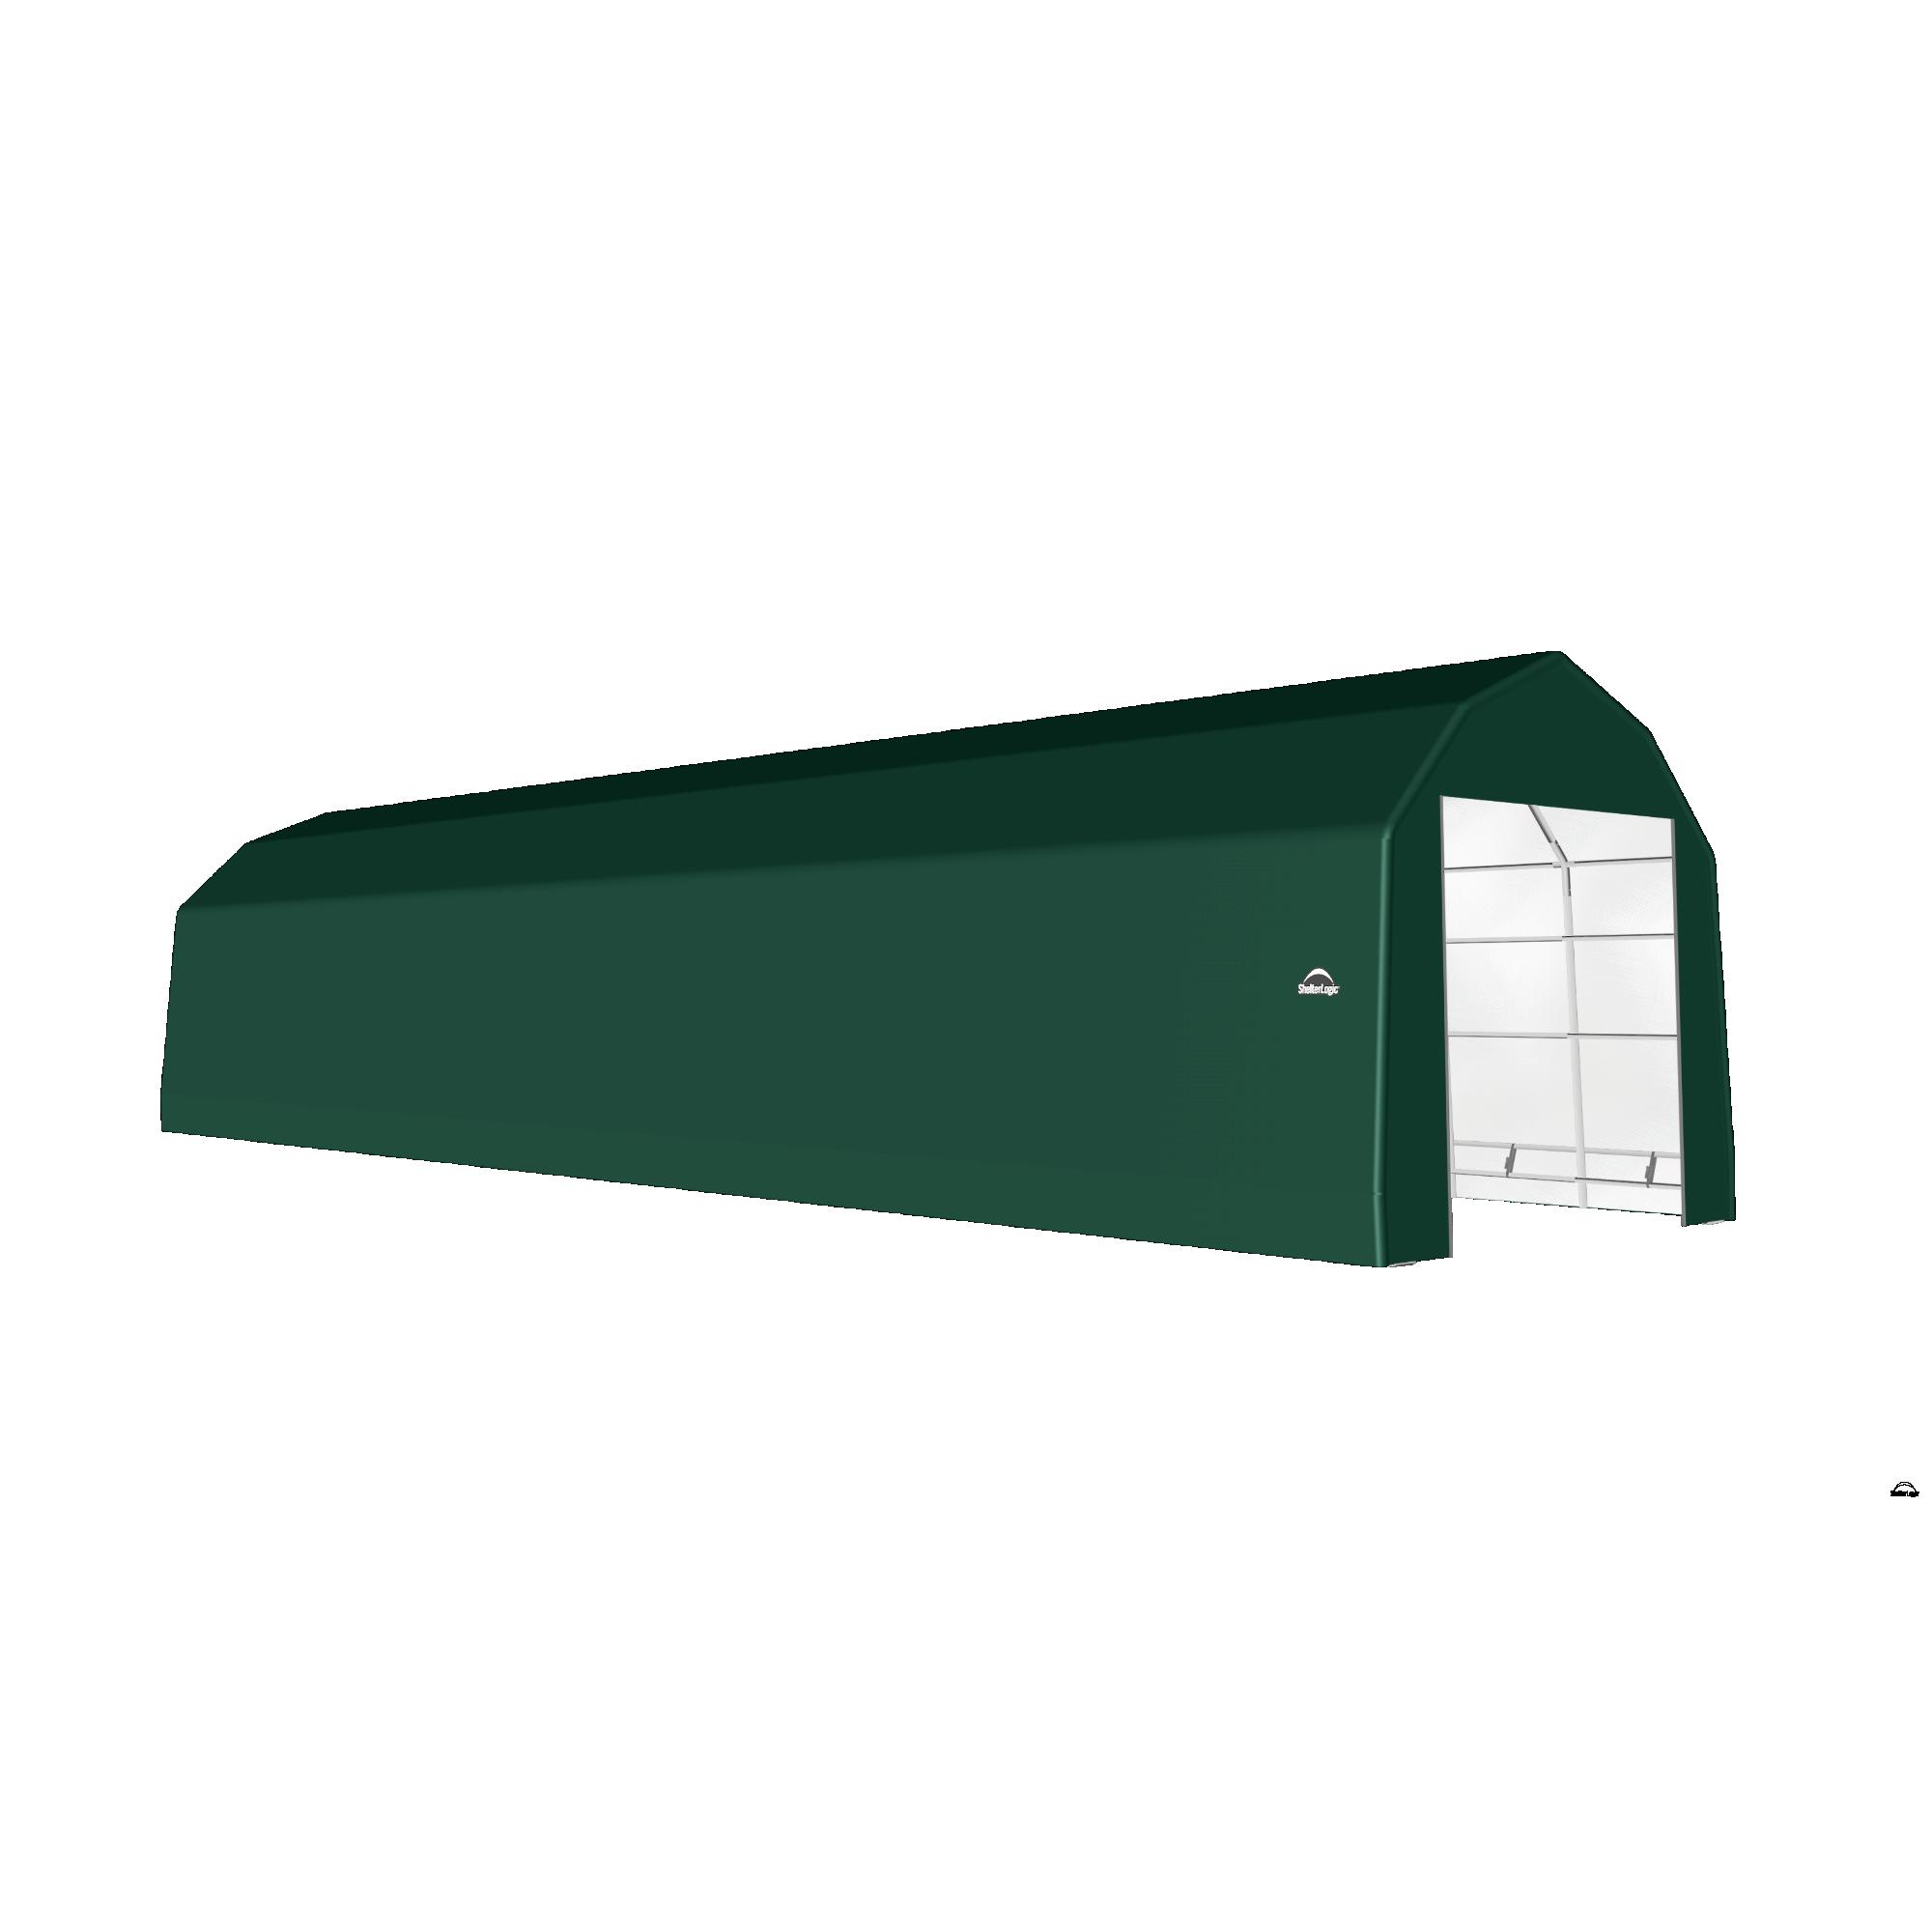 SP Barn 15X56X14 Green 14 oz PE Shelter